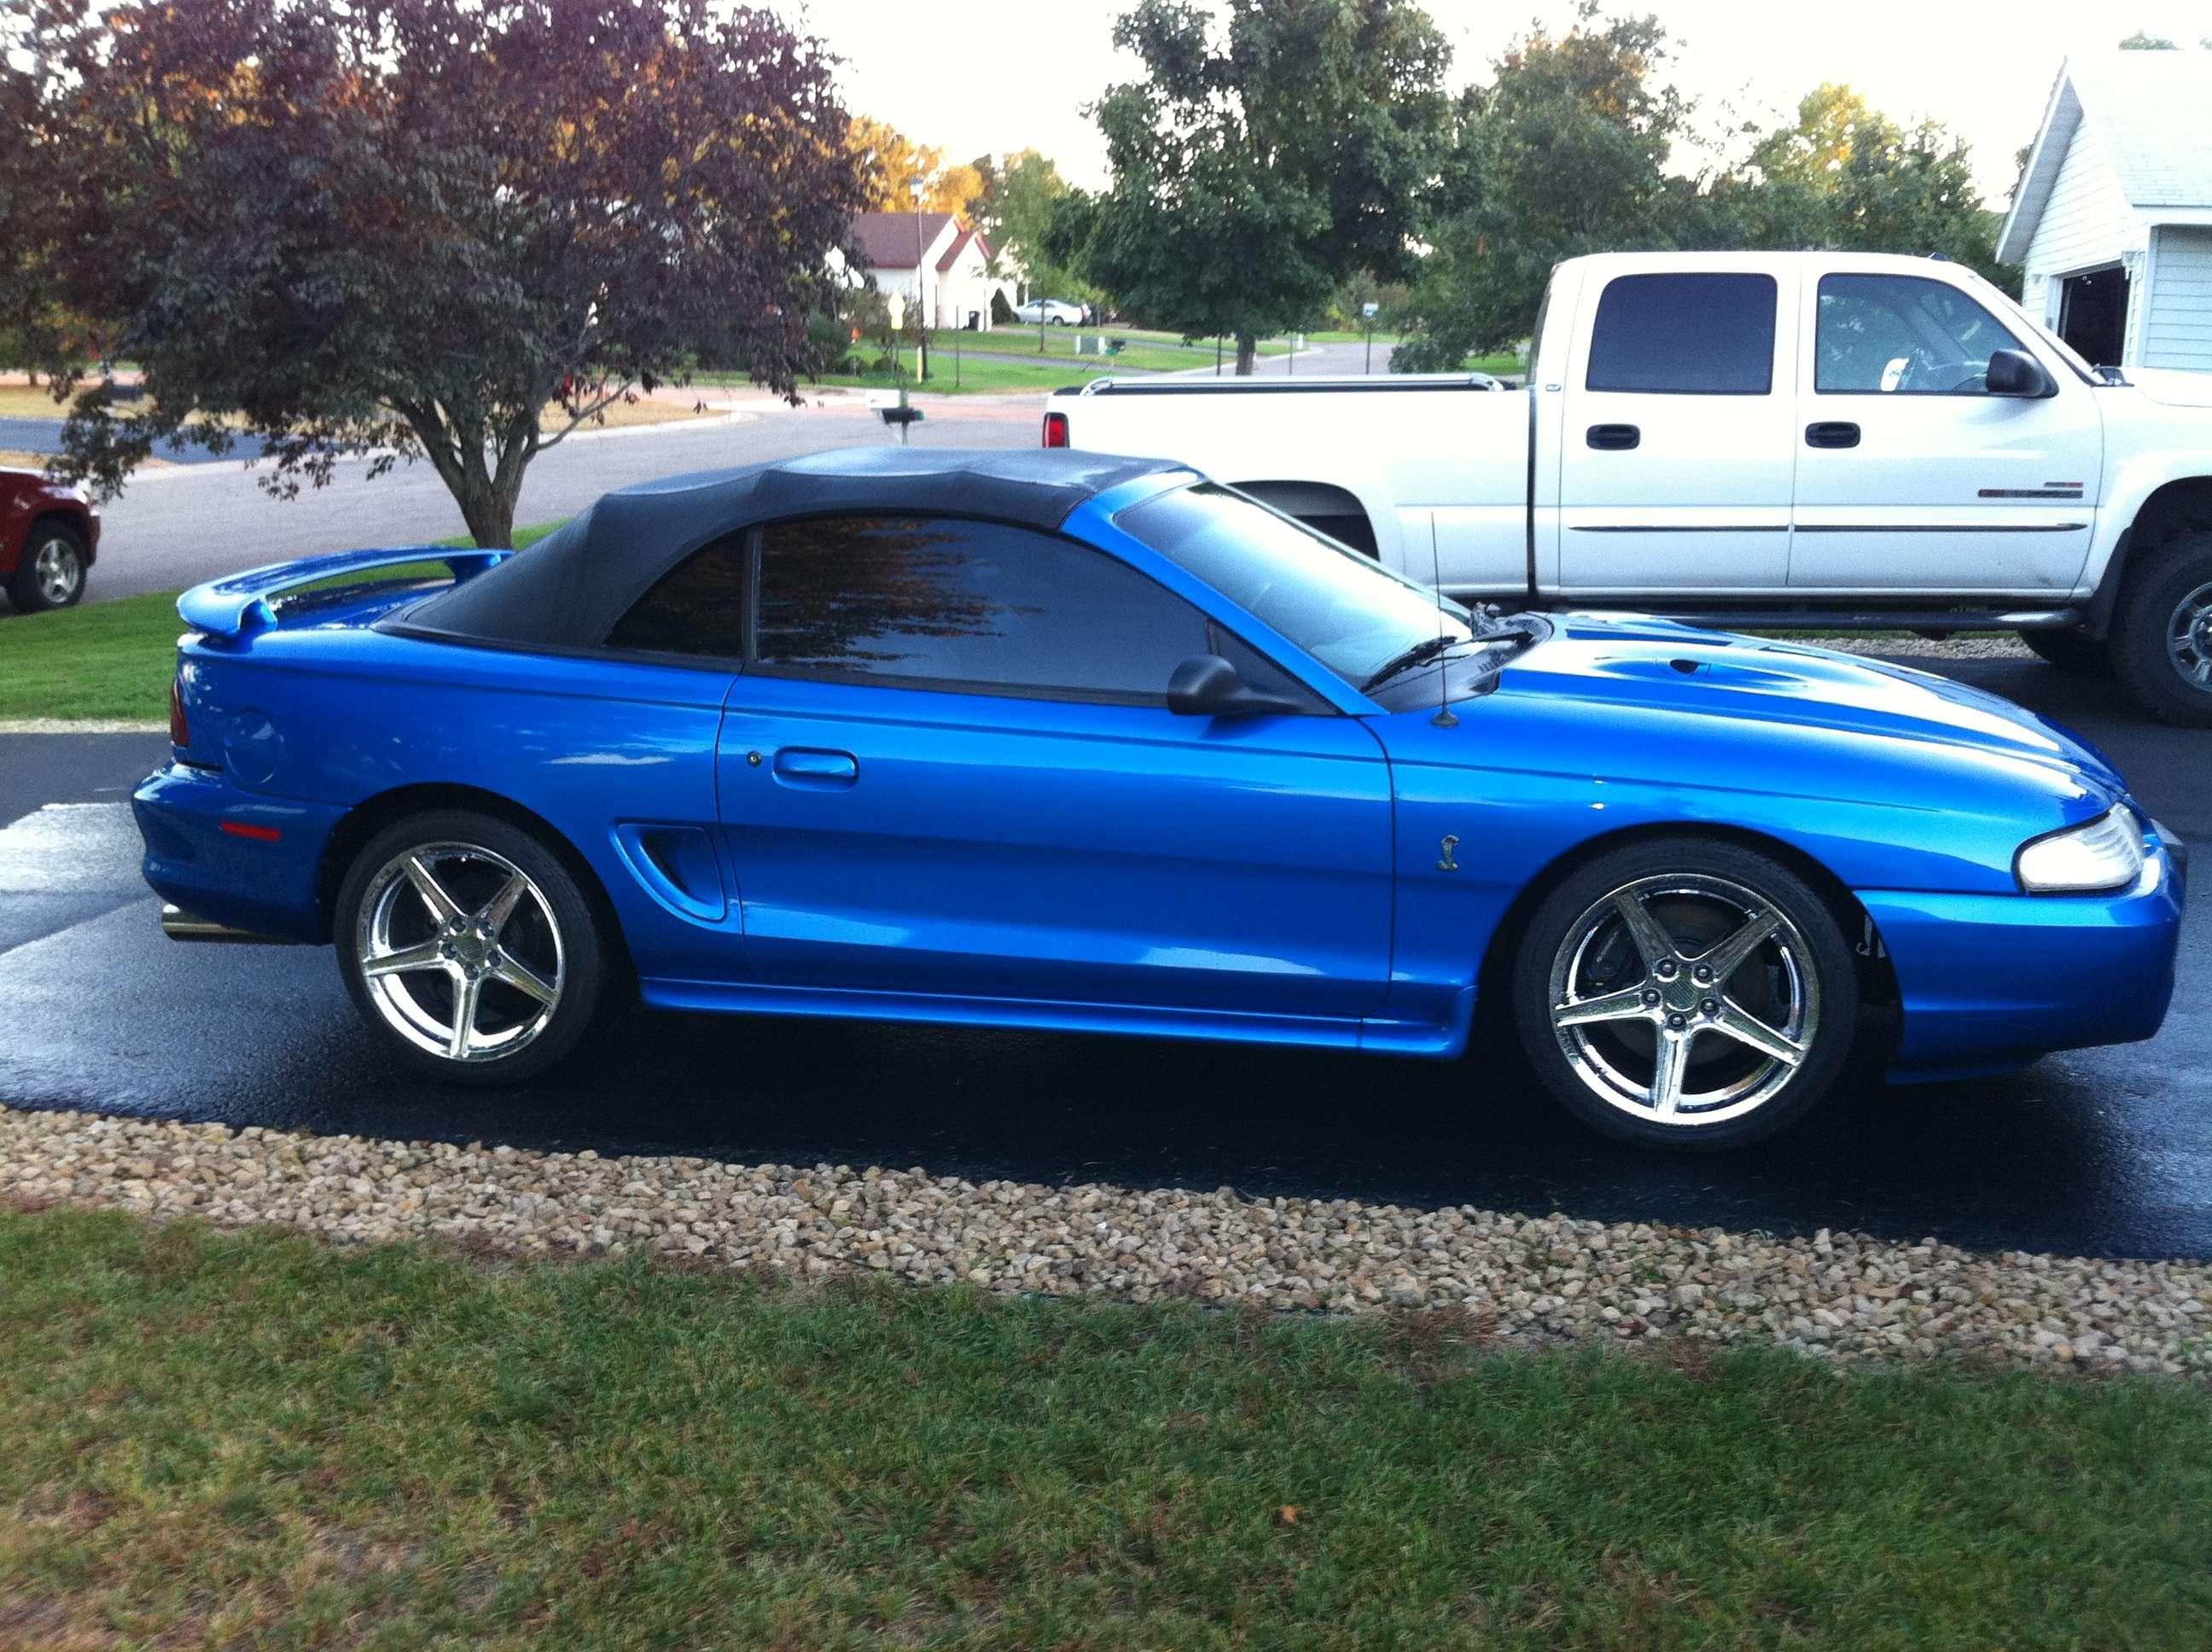 1998 Cobra Bright Atlantic Blue Convertible Svtperformance Com